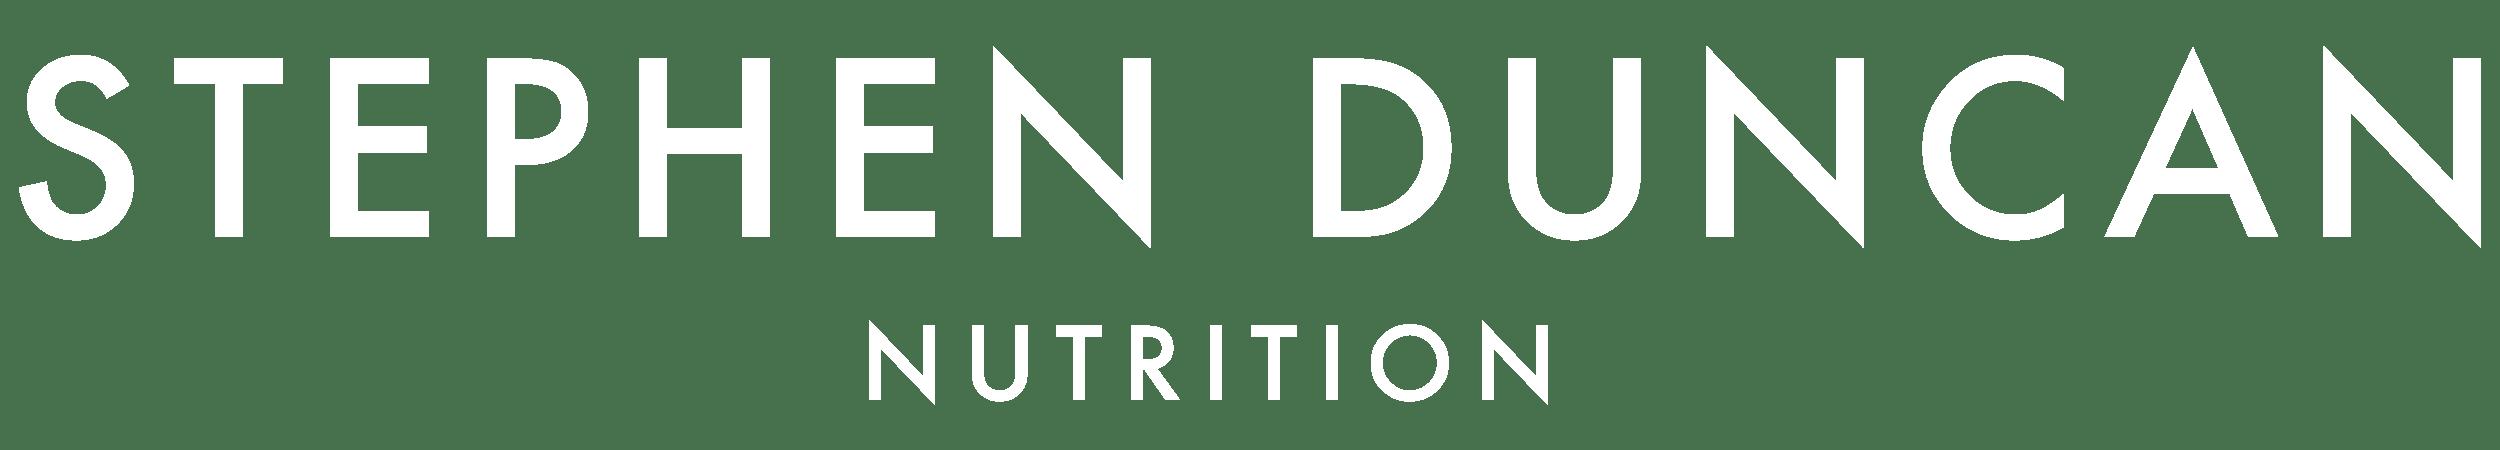 Stephen Duncan Nutrition Logo